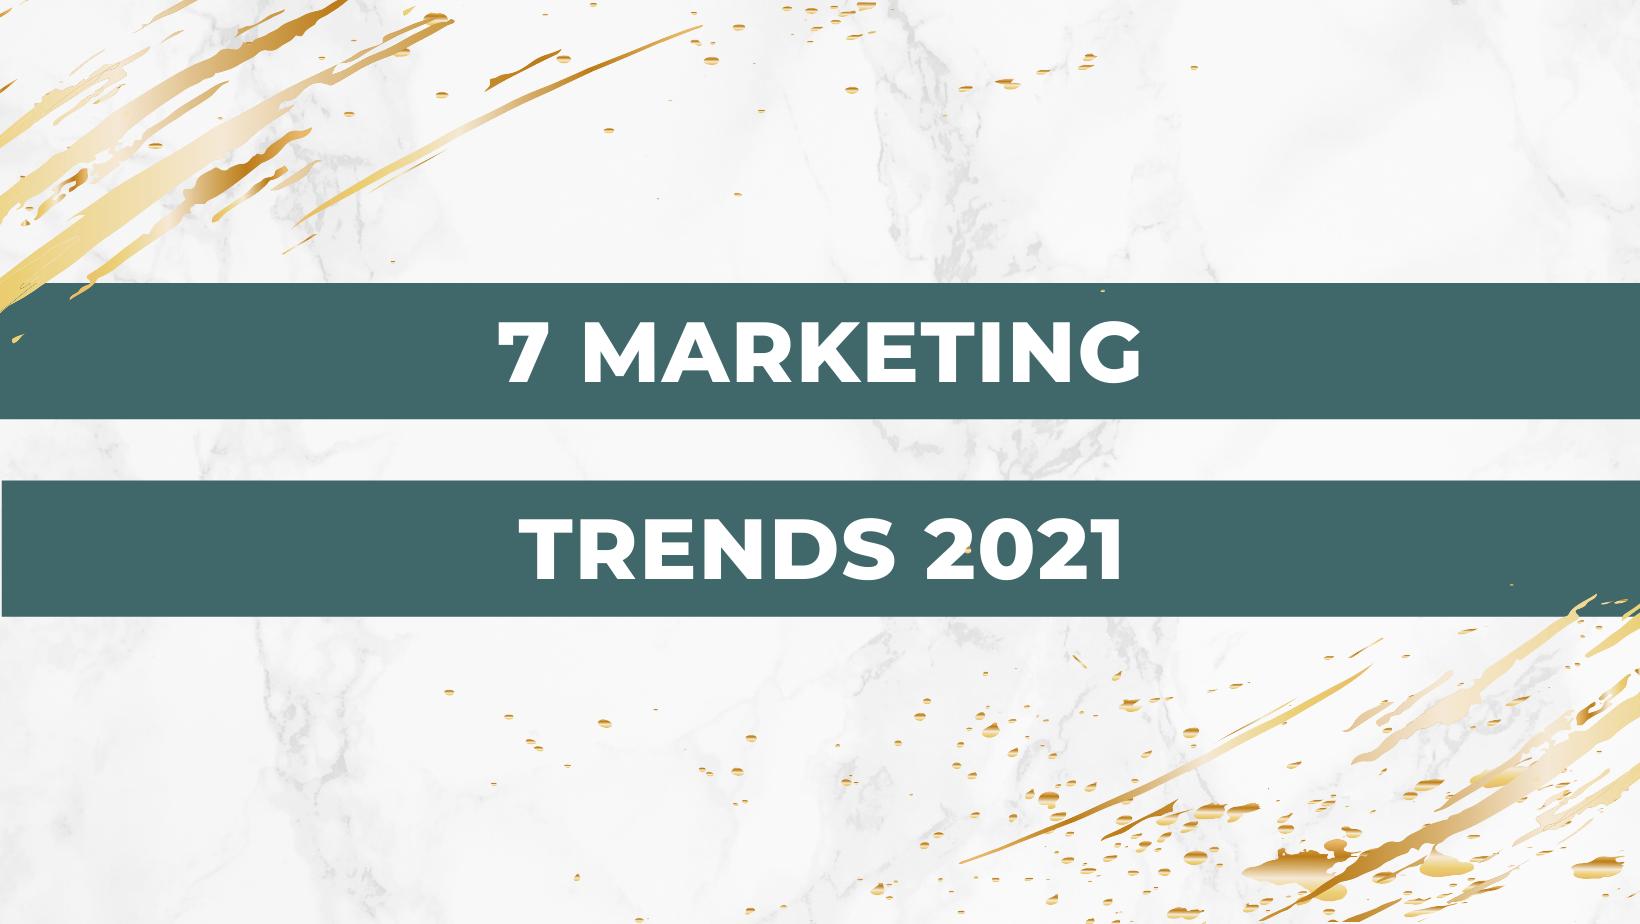 7 Marketing Trends 2021